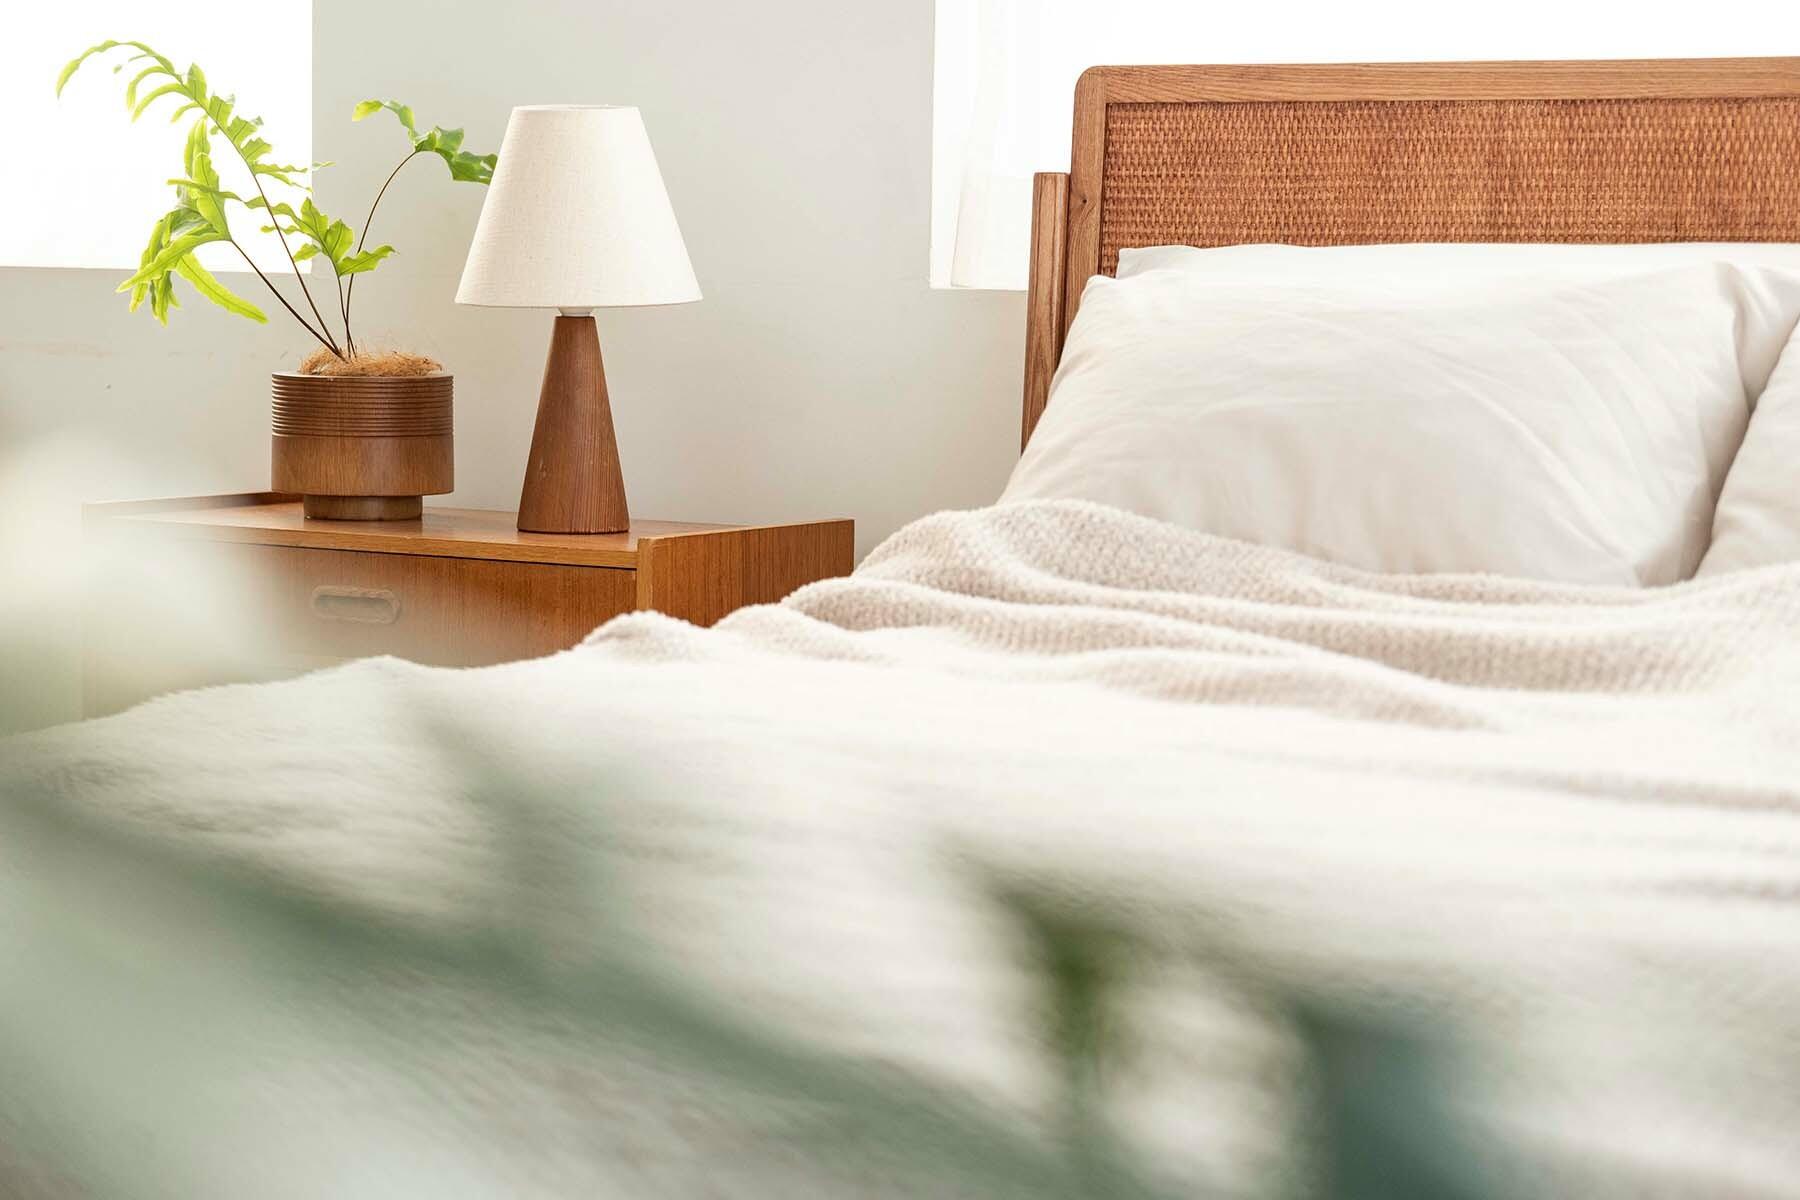 inTHE studio|nakameguro (インザスタジオ|ナカメグロ)Equipment